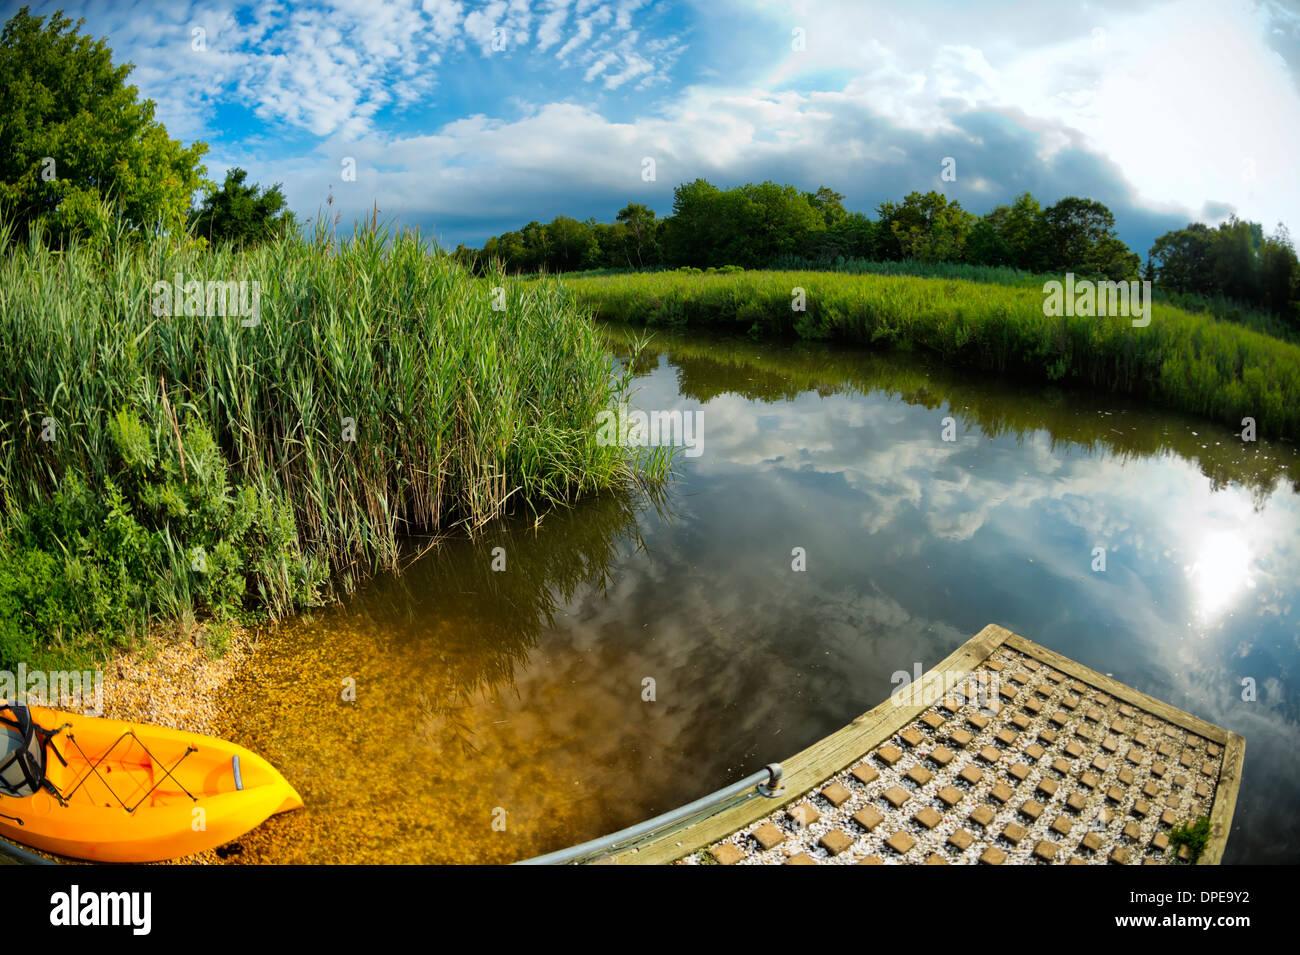 peaceful-marshland-stream-with-ramp-oran